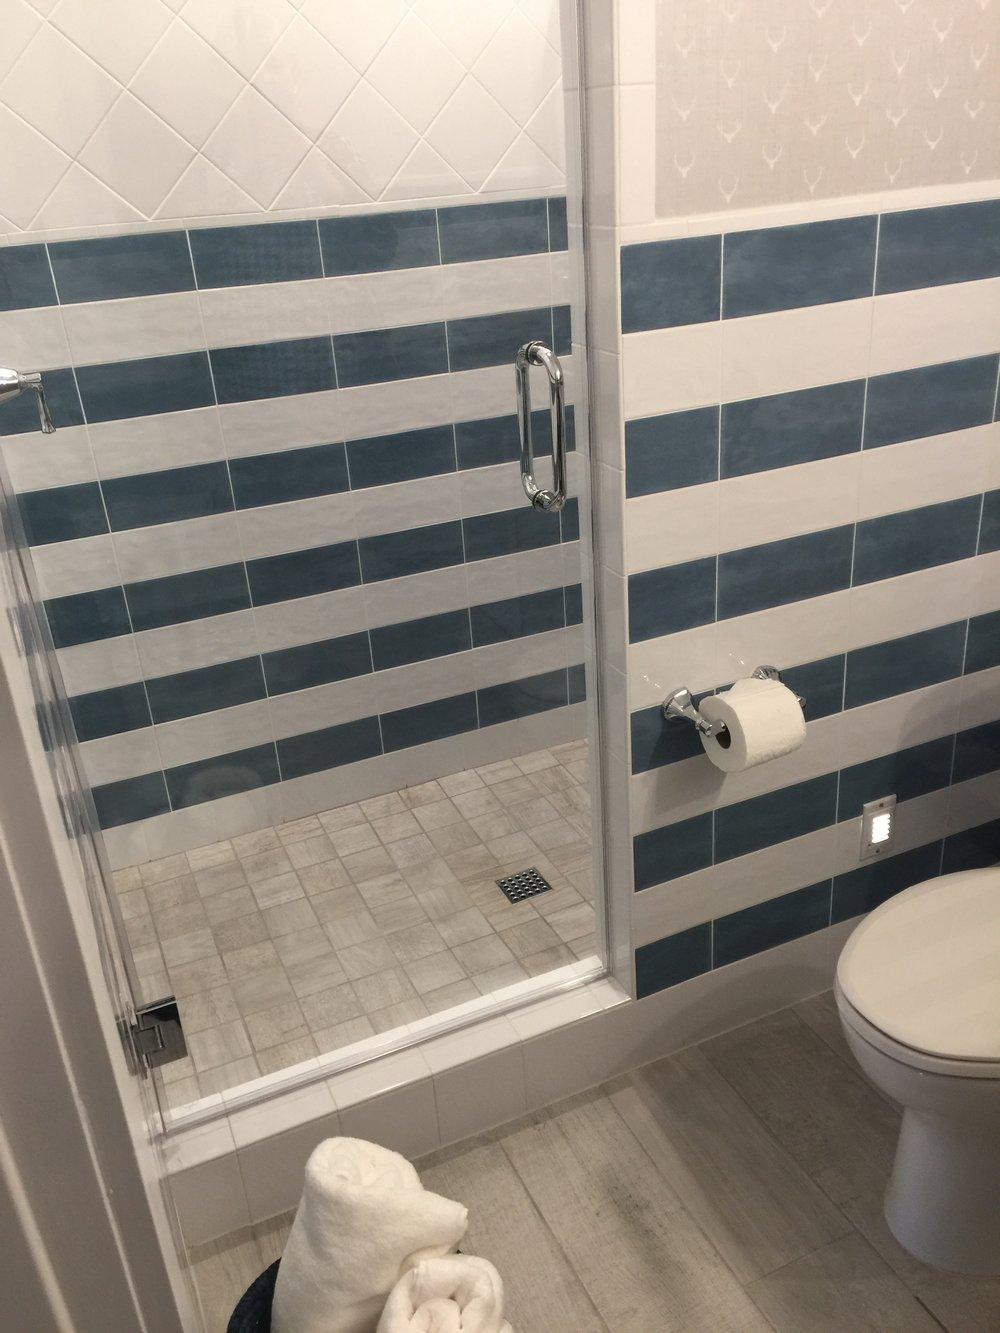 Unique stripe tiled bathroom - Southern Living Showcase Home